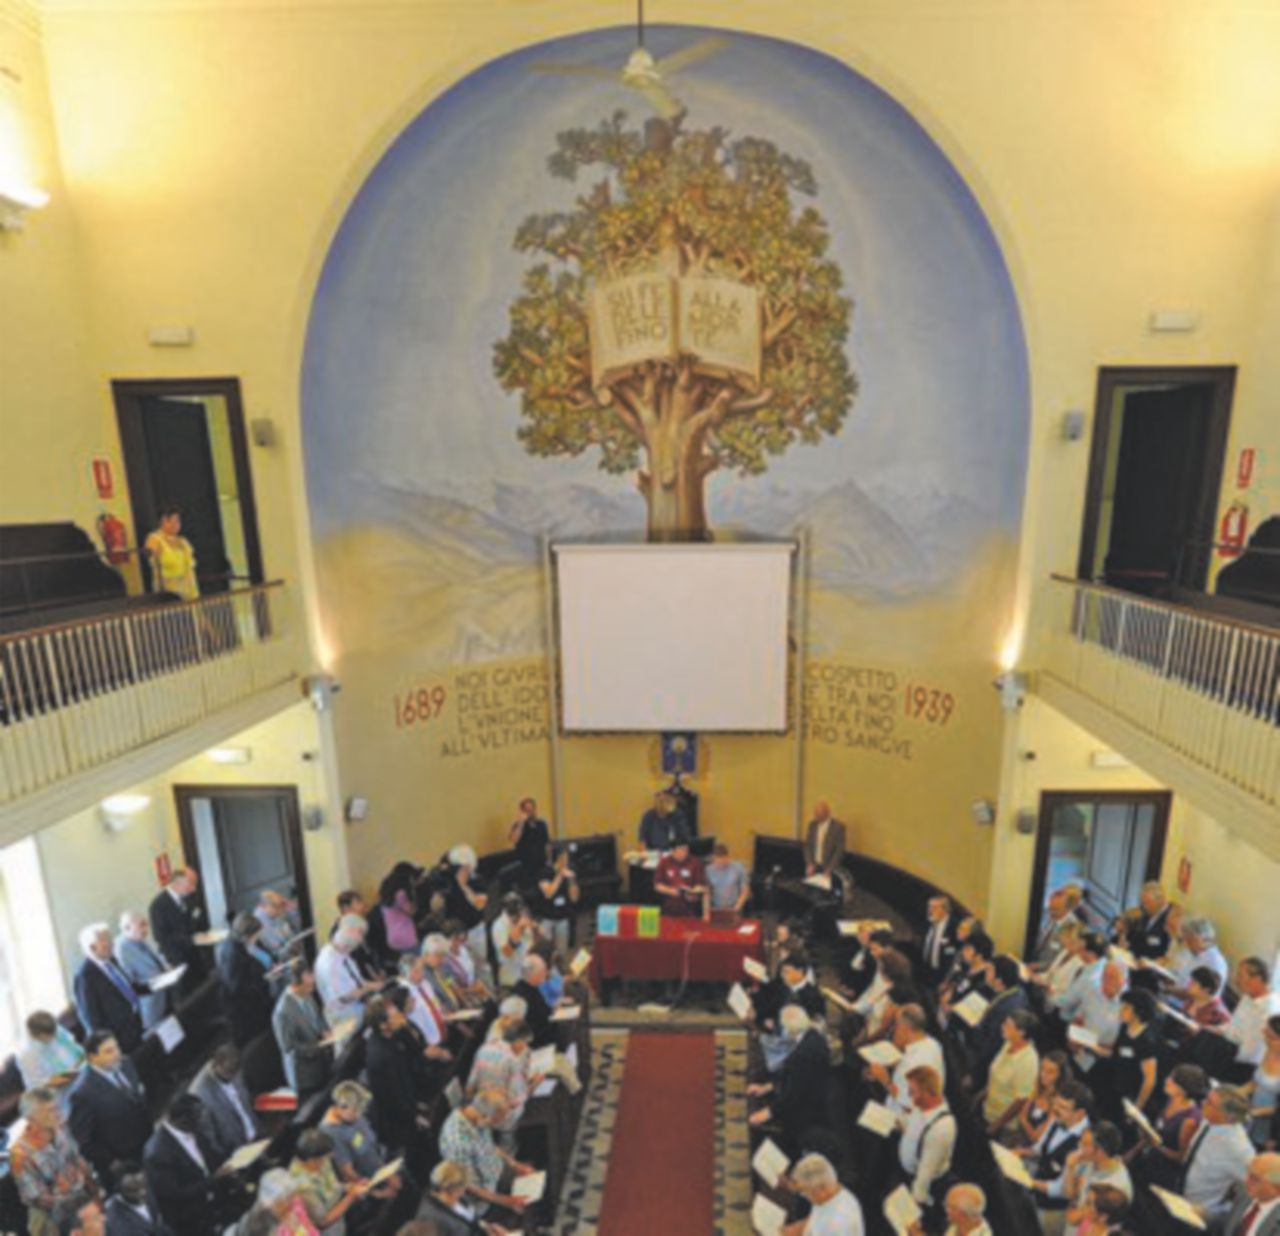 Il Sinodo valdese apre su eutanasia e coppie gay